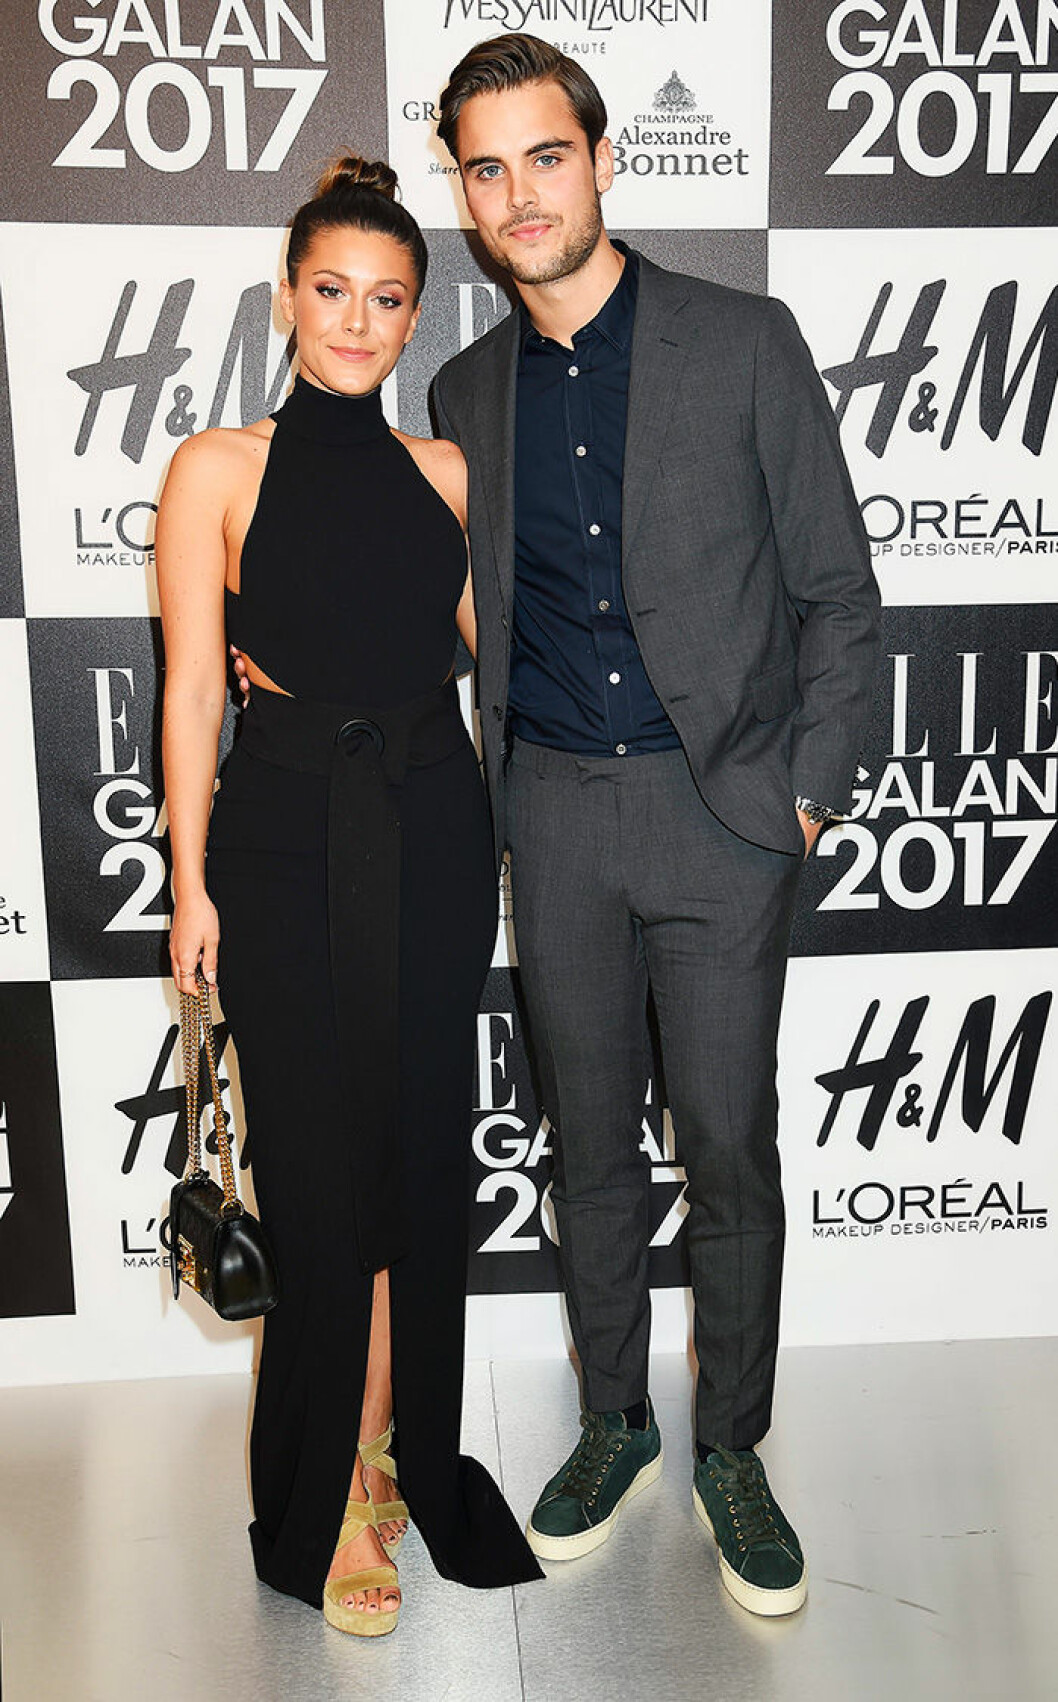 En bild på Bianca Ingrosso och Phillipe Cohen på ELLE-galan 2017.